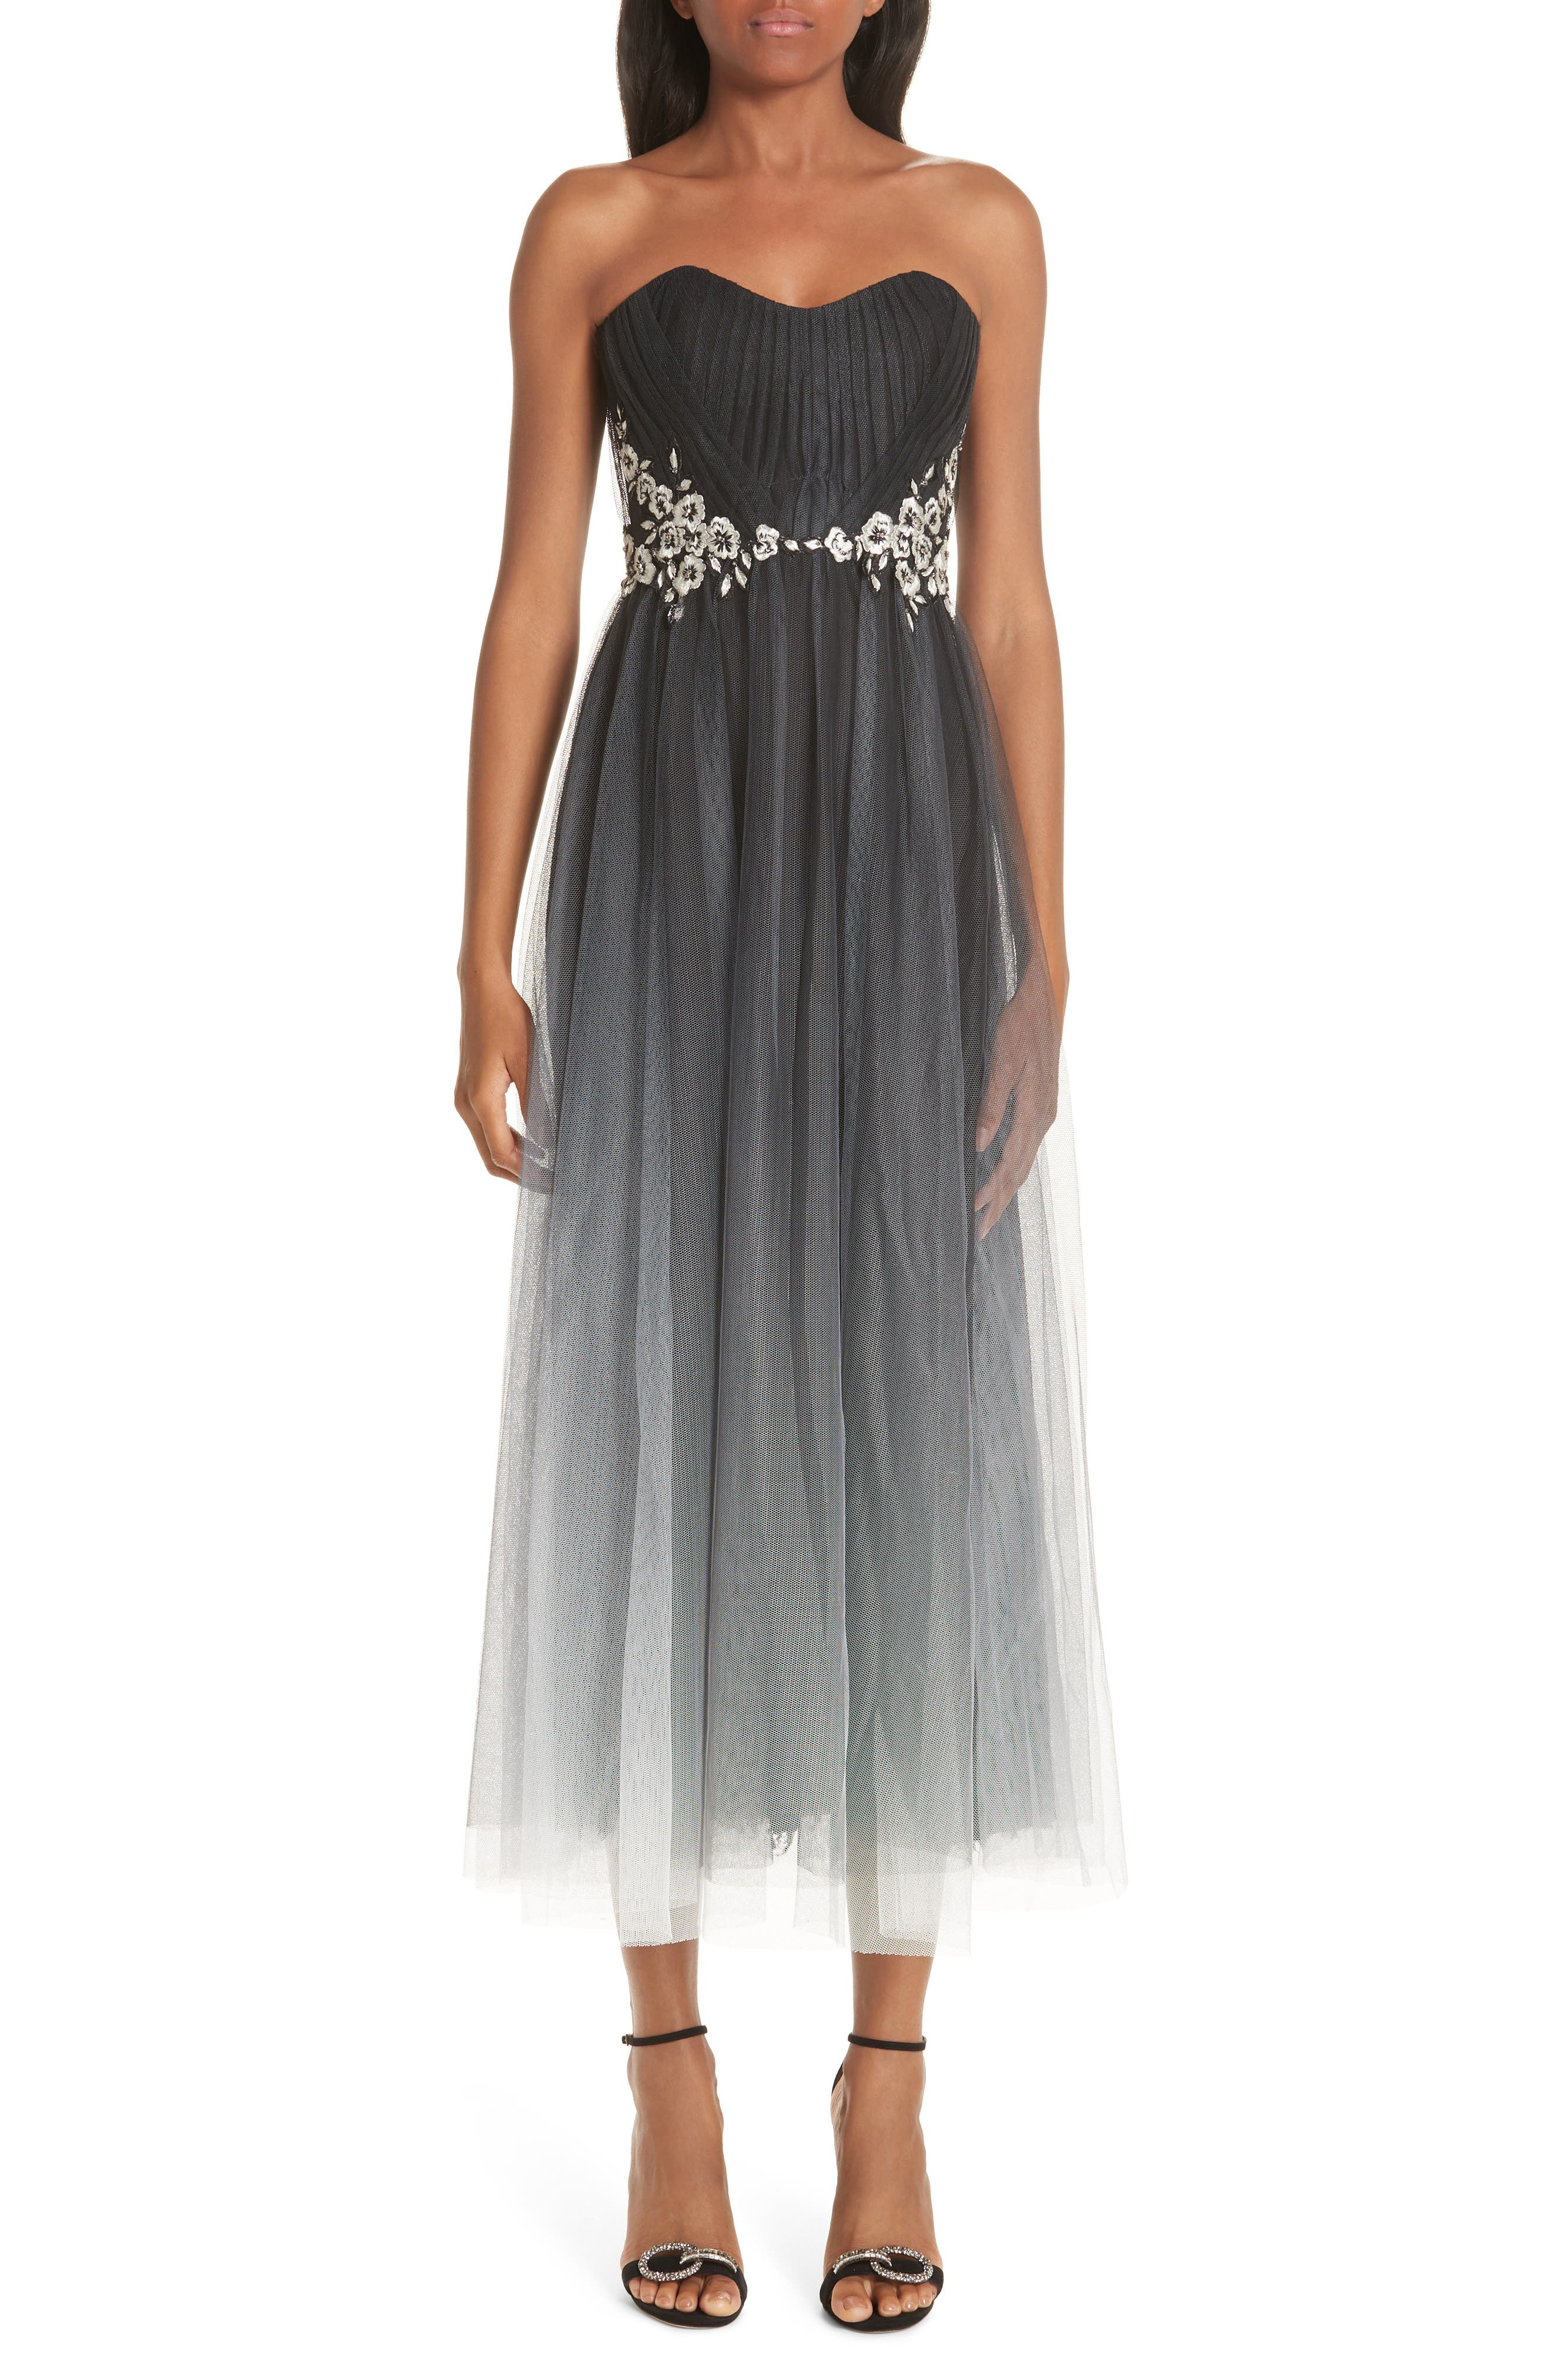 Marchesa Notte Strapless Ombre Tulle Tea Length Dress